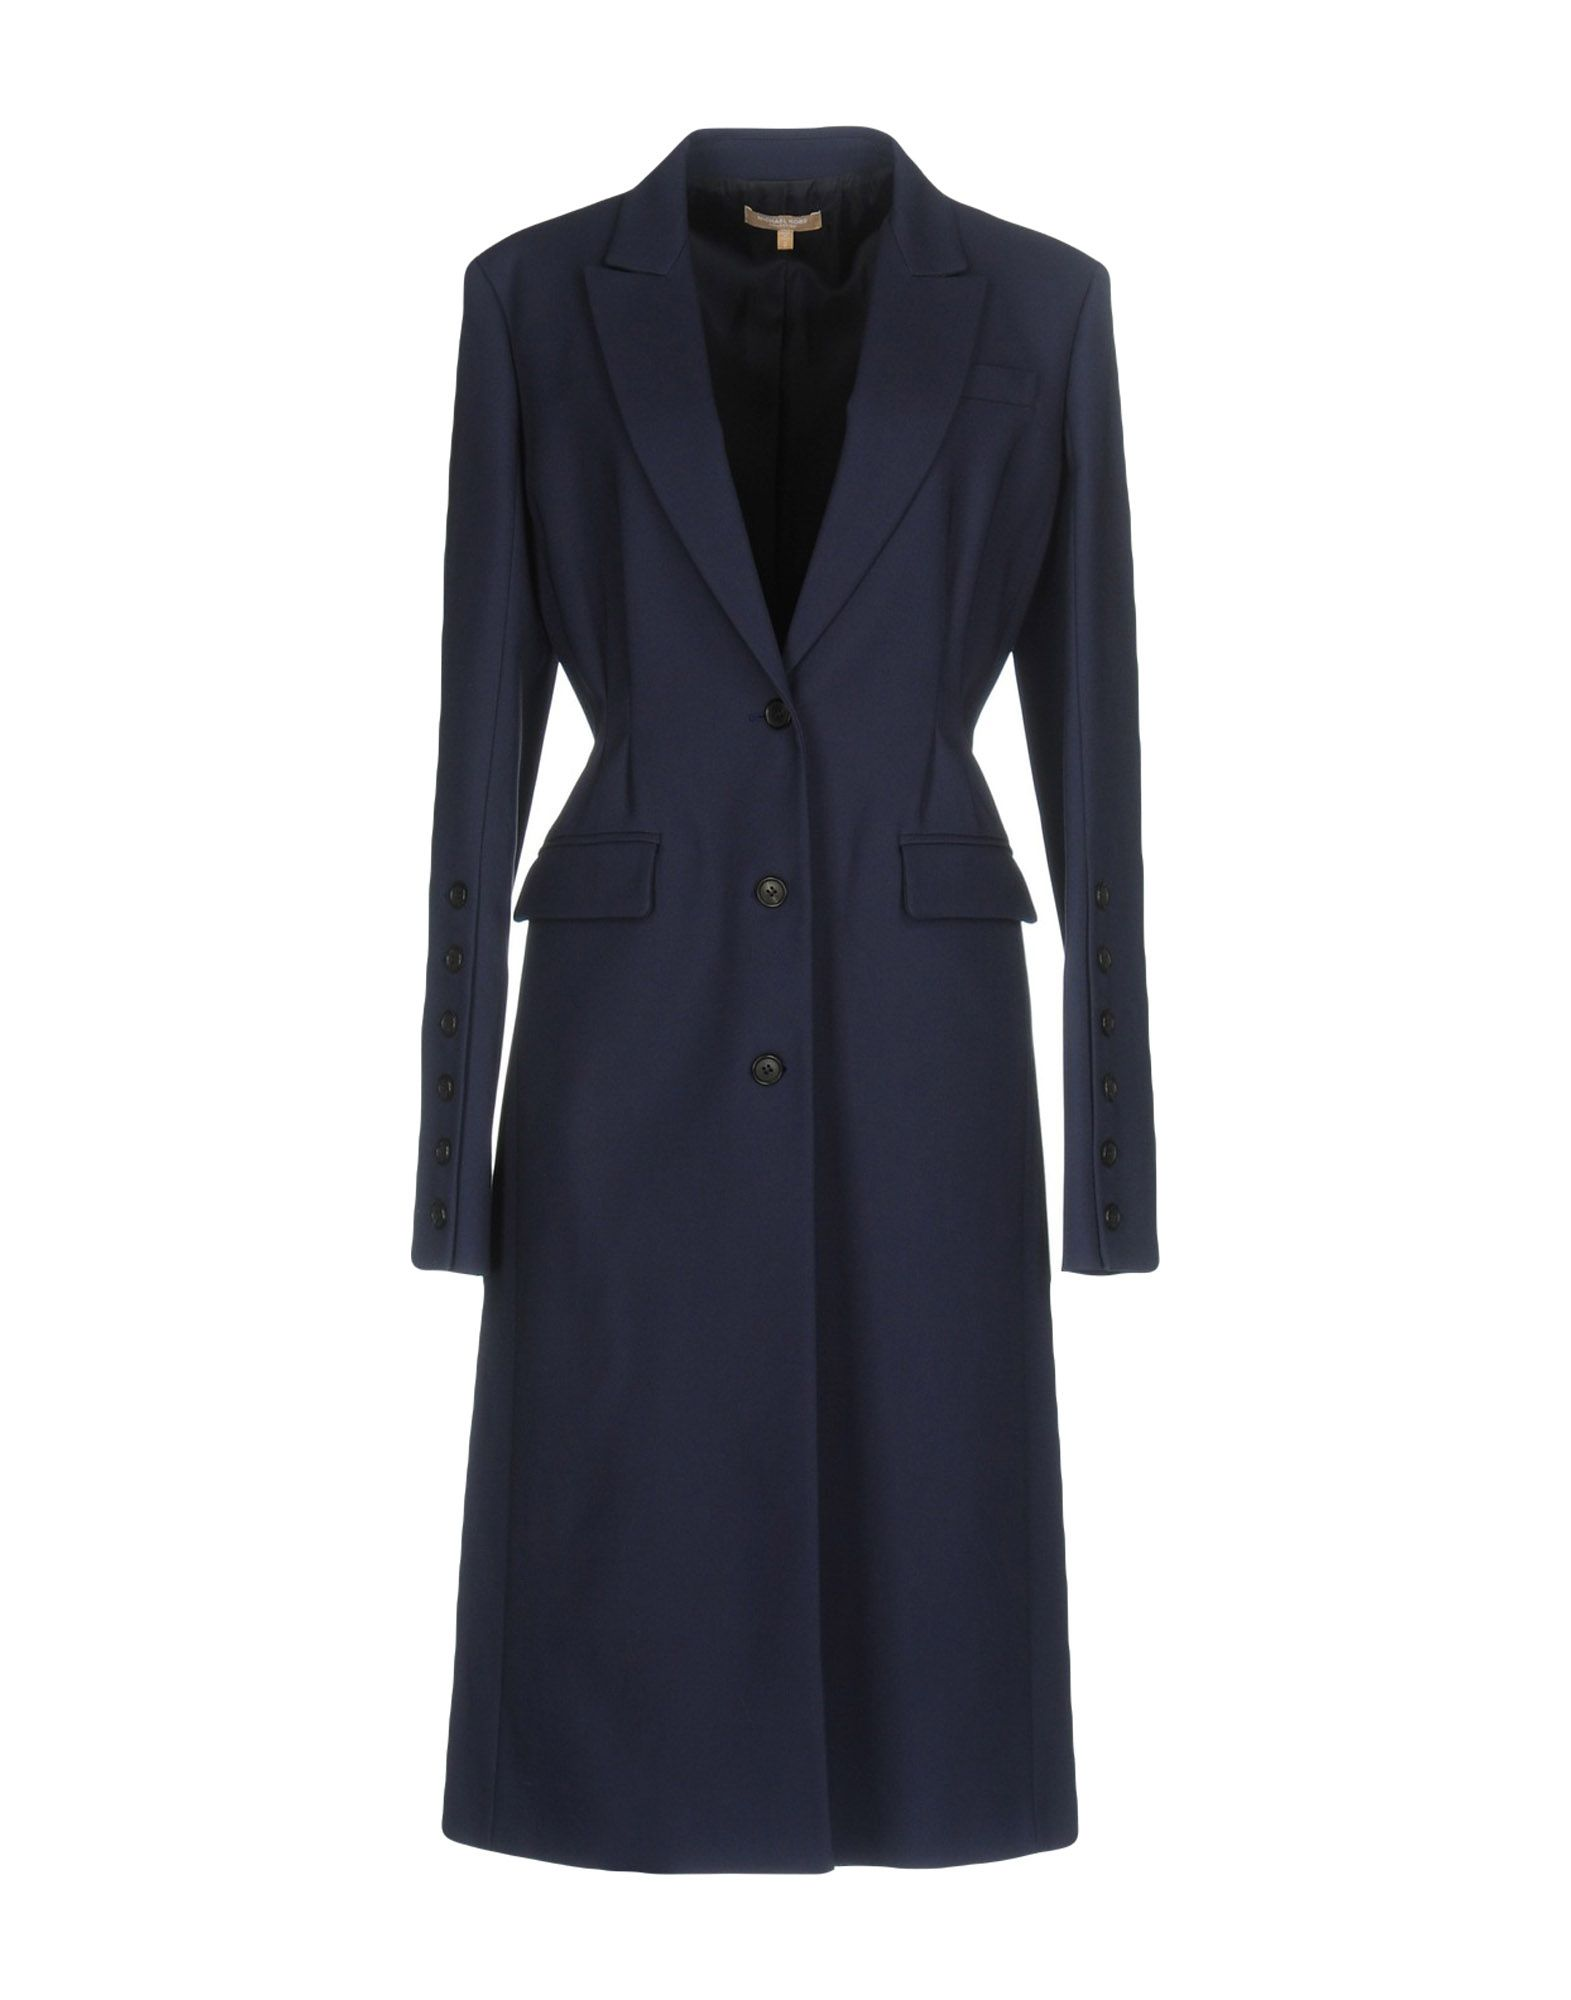 MICHAEL KORS COLLECTION Damen Lange Jacke Farbe Blau Größe 2